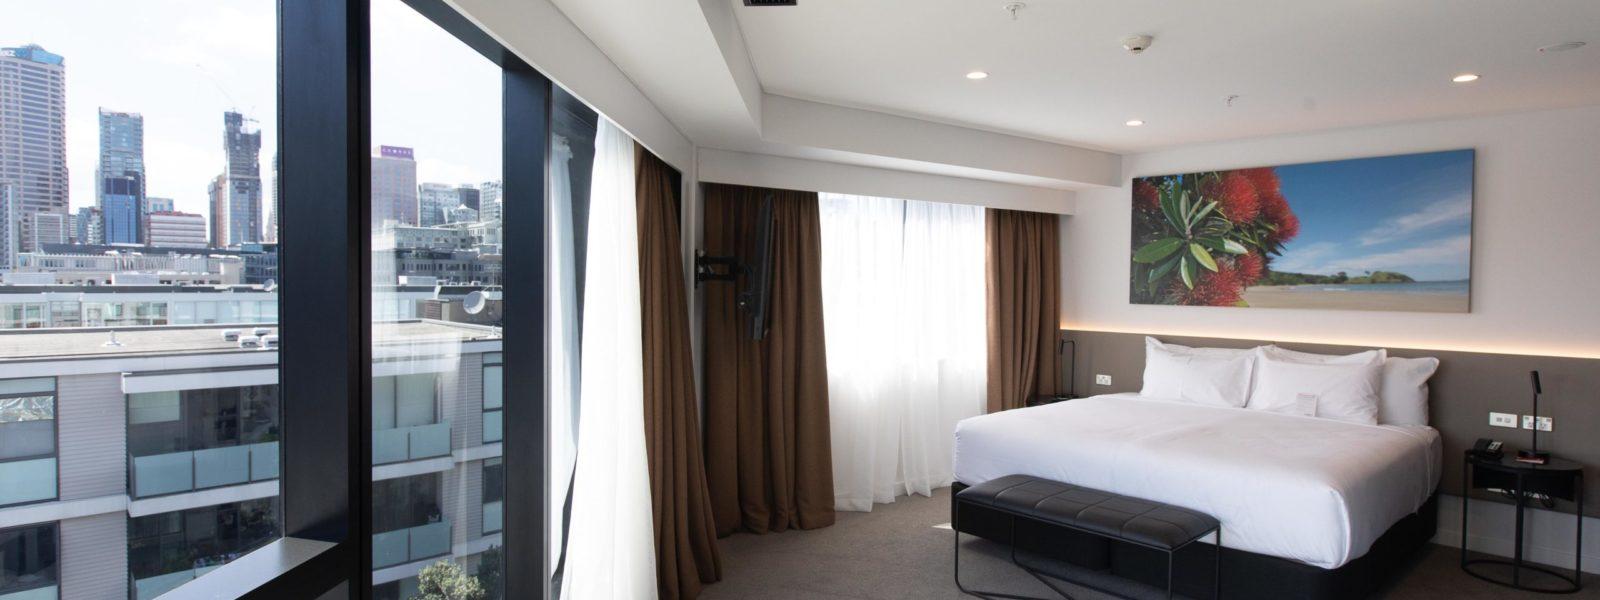 Wynyard 100 Travelodge Hotel Room